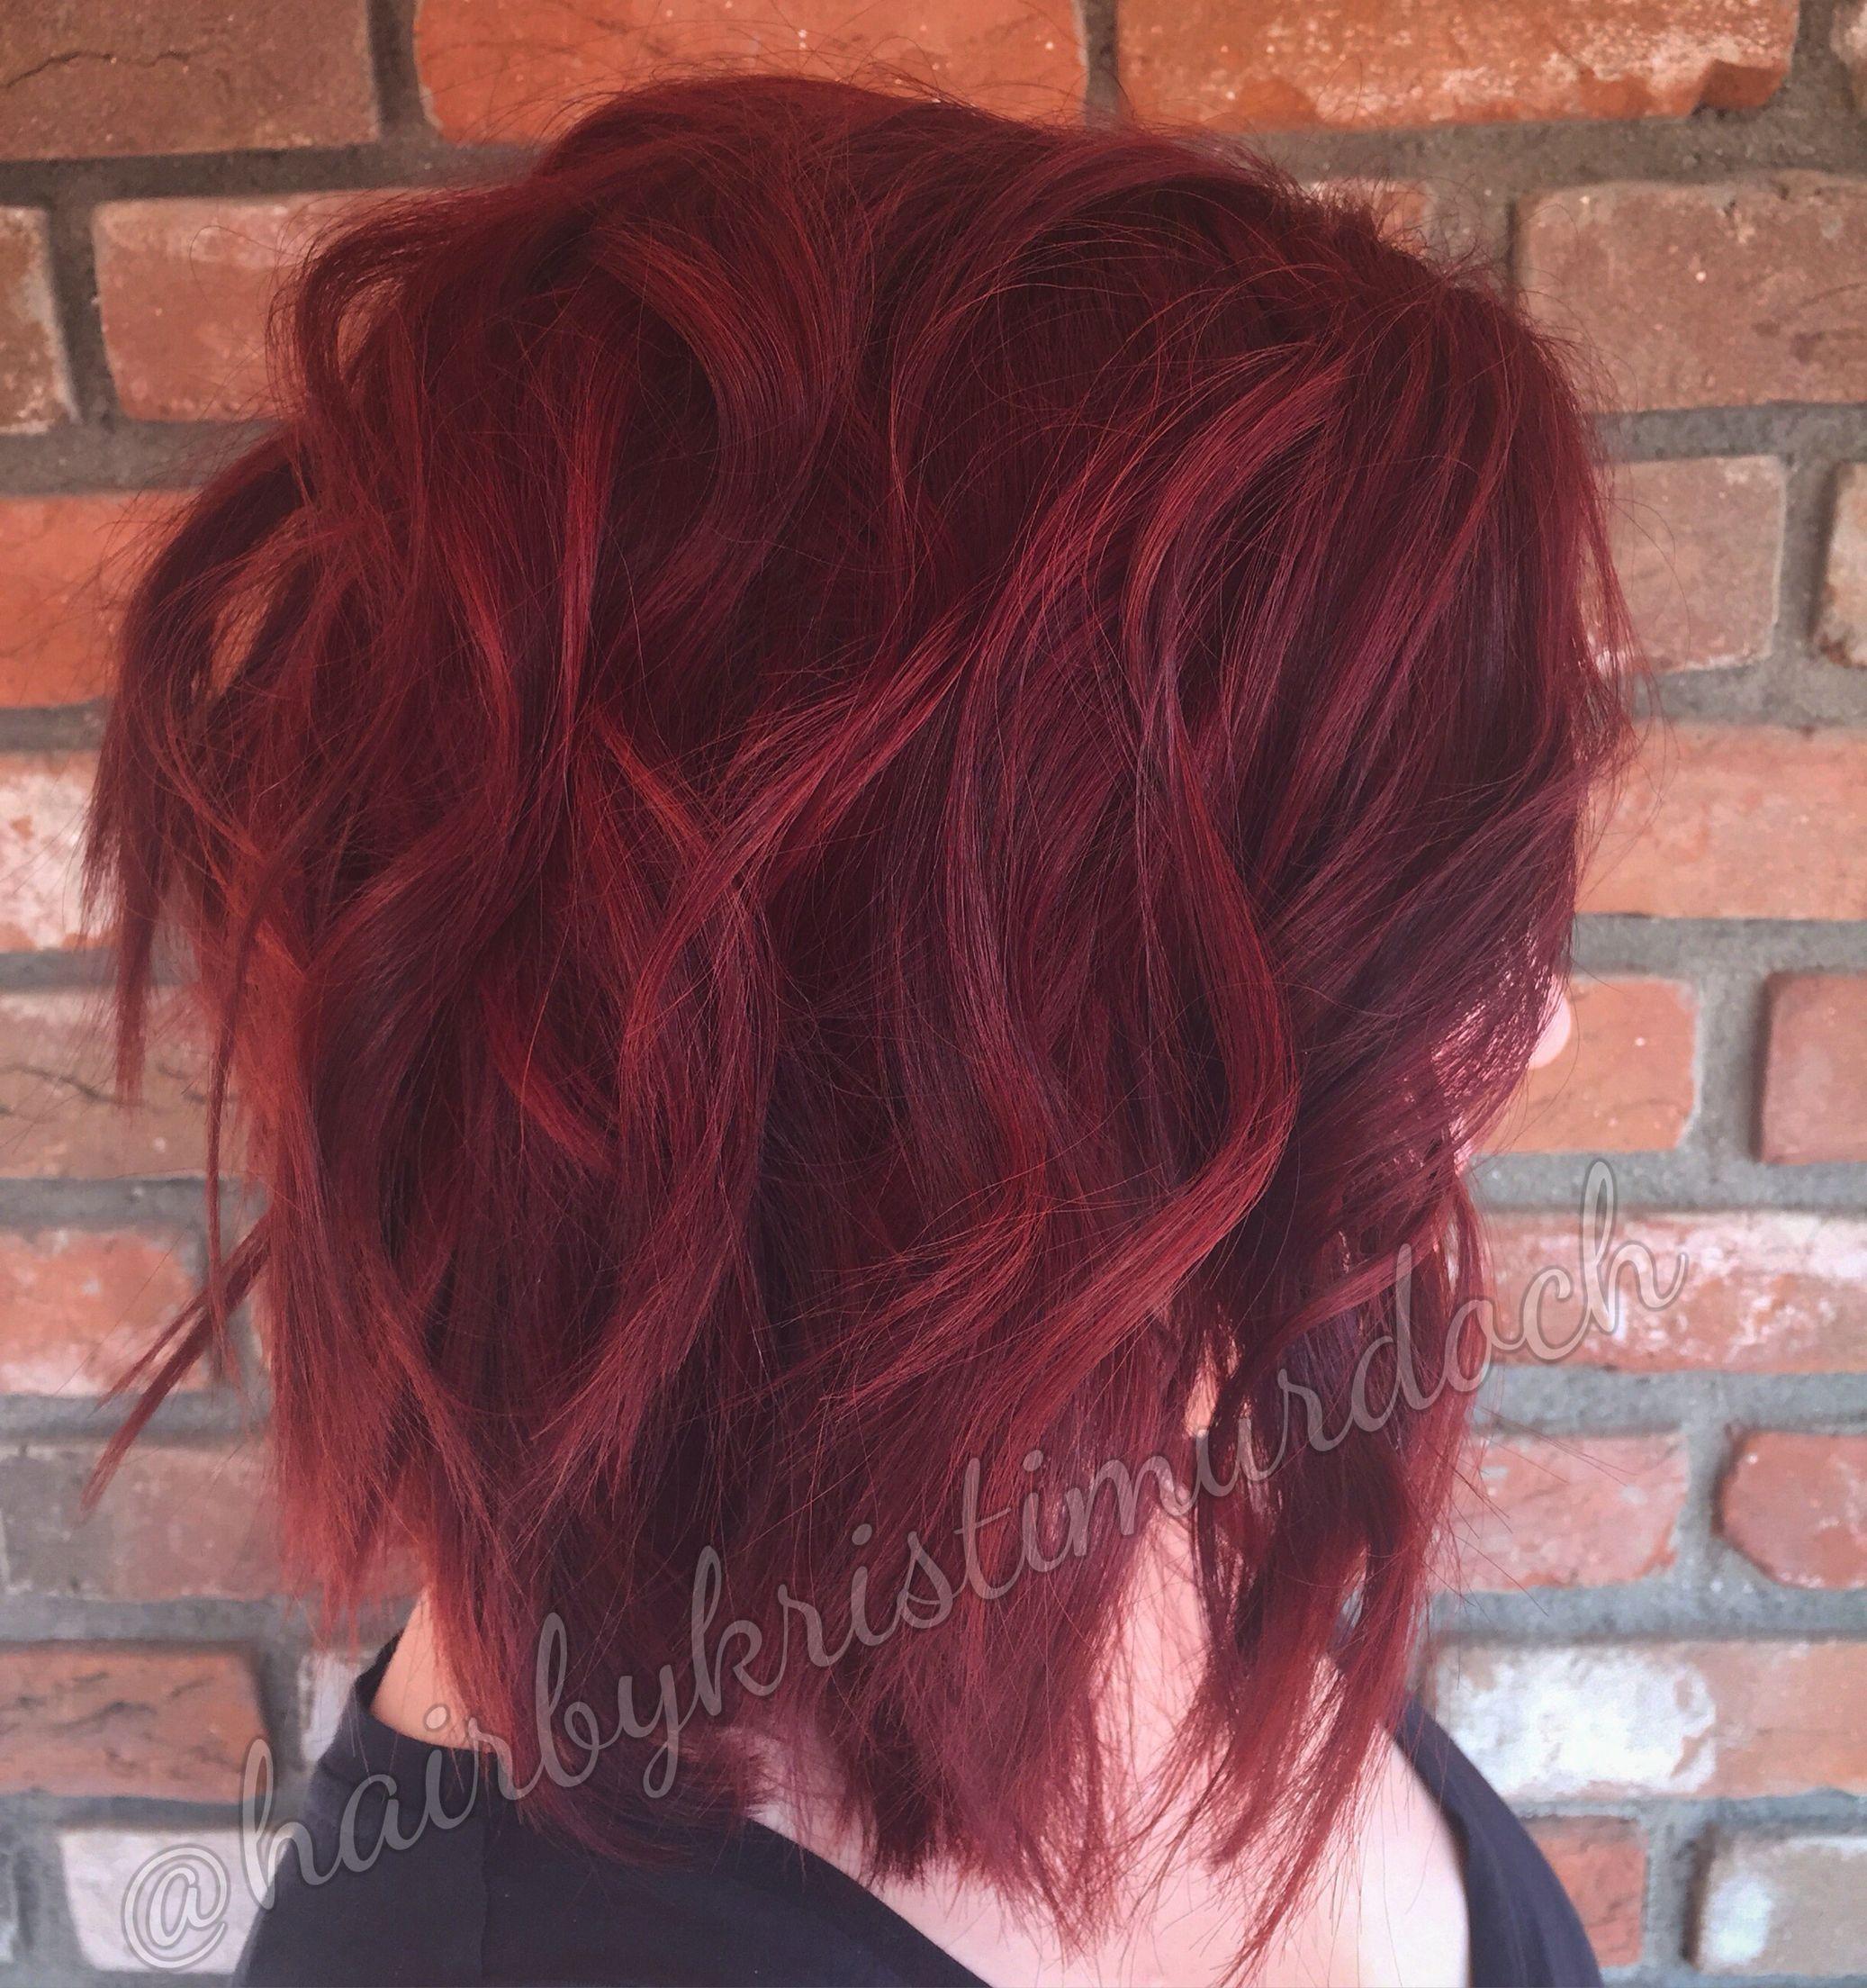 Red Hair Ruby Red Hair Bright Red Hair Red Velvet Hair Color Shades Eq 6rr 6aa Lob Long Bob Mess Red Velvet Hair Color Hair Styles Ruby Red Hair Color